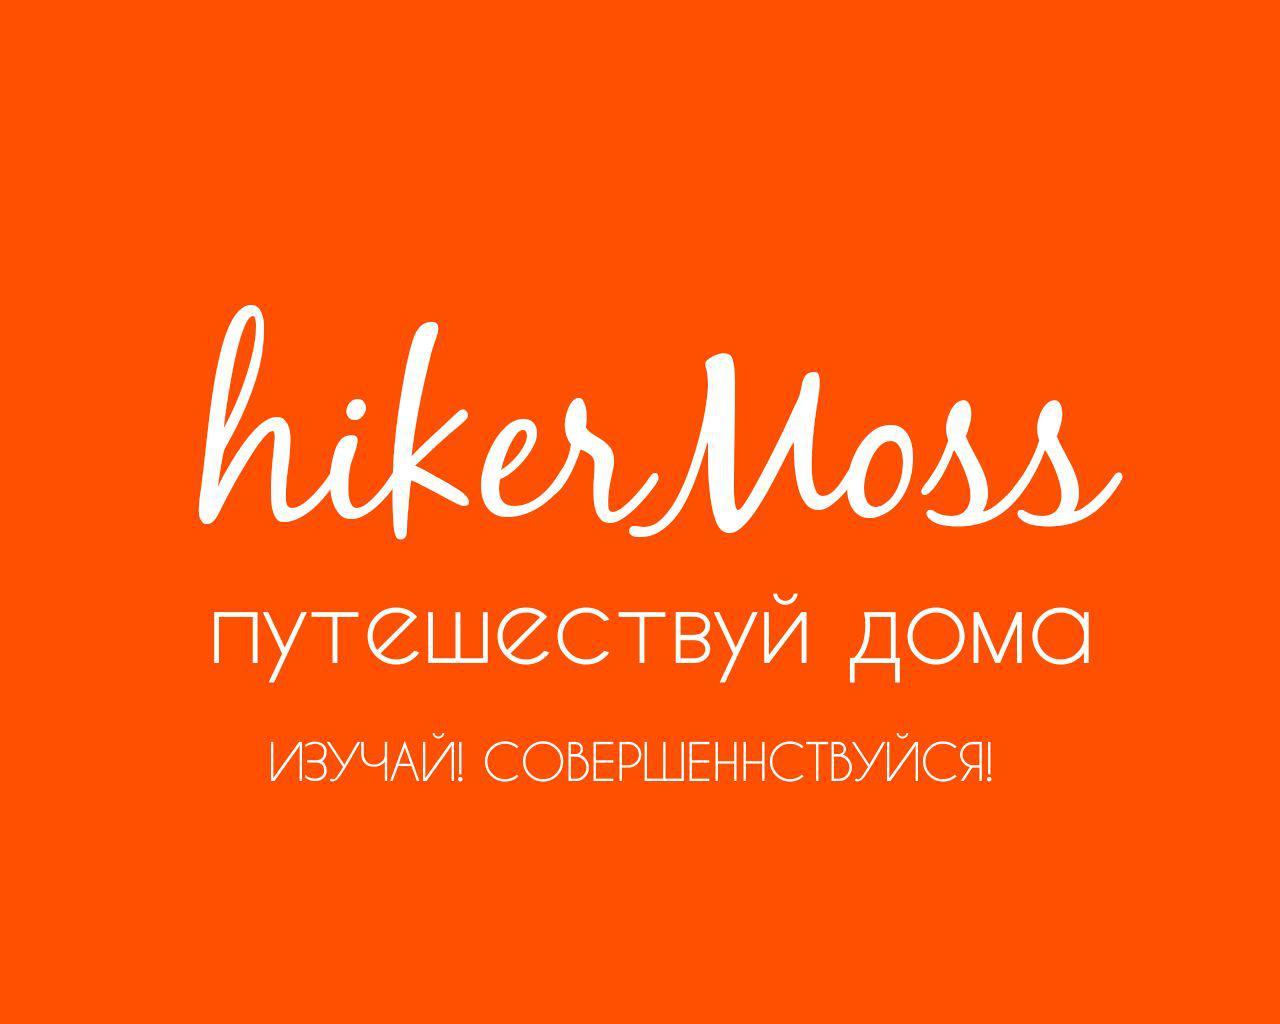 hikerMoss_путешествуя